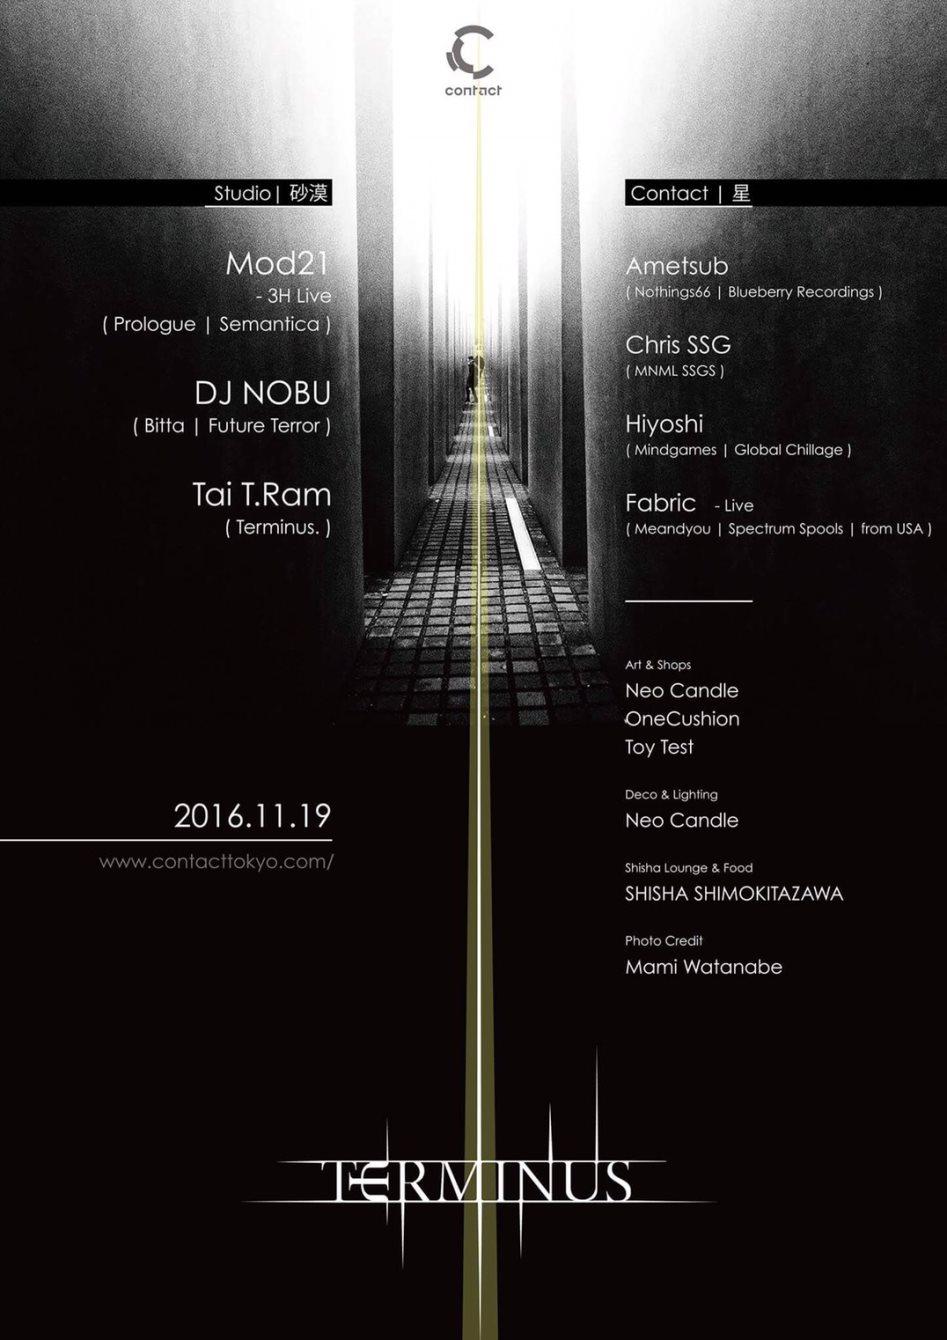 Terminus. with DJ Nobu & Mod21 - Flyer front